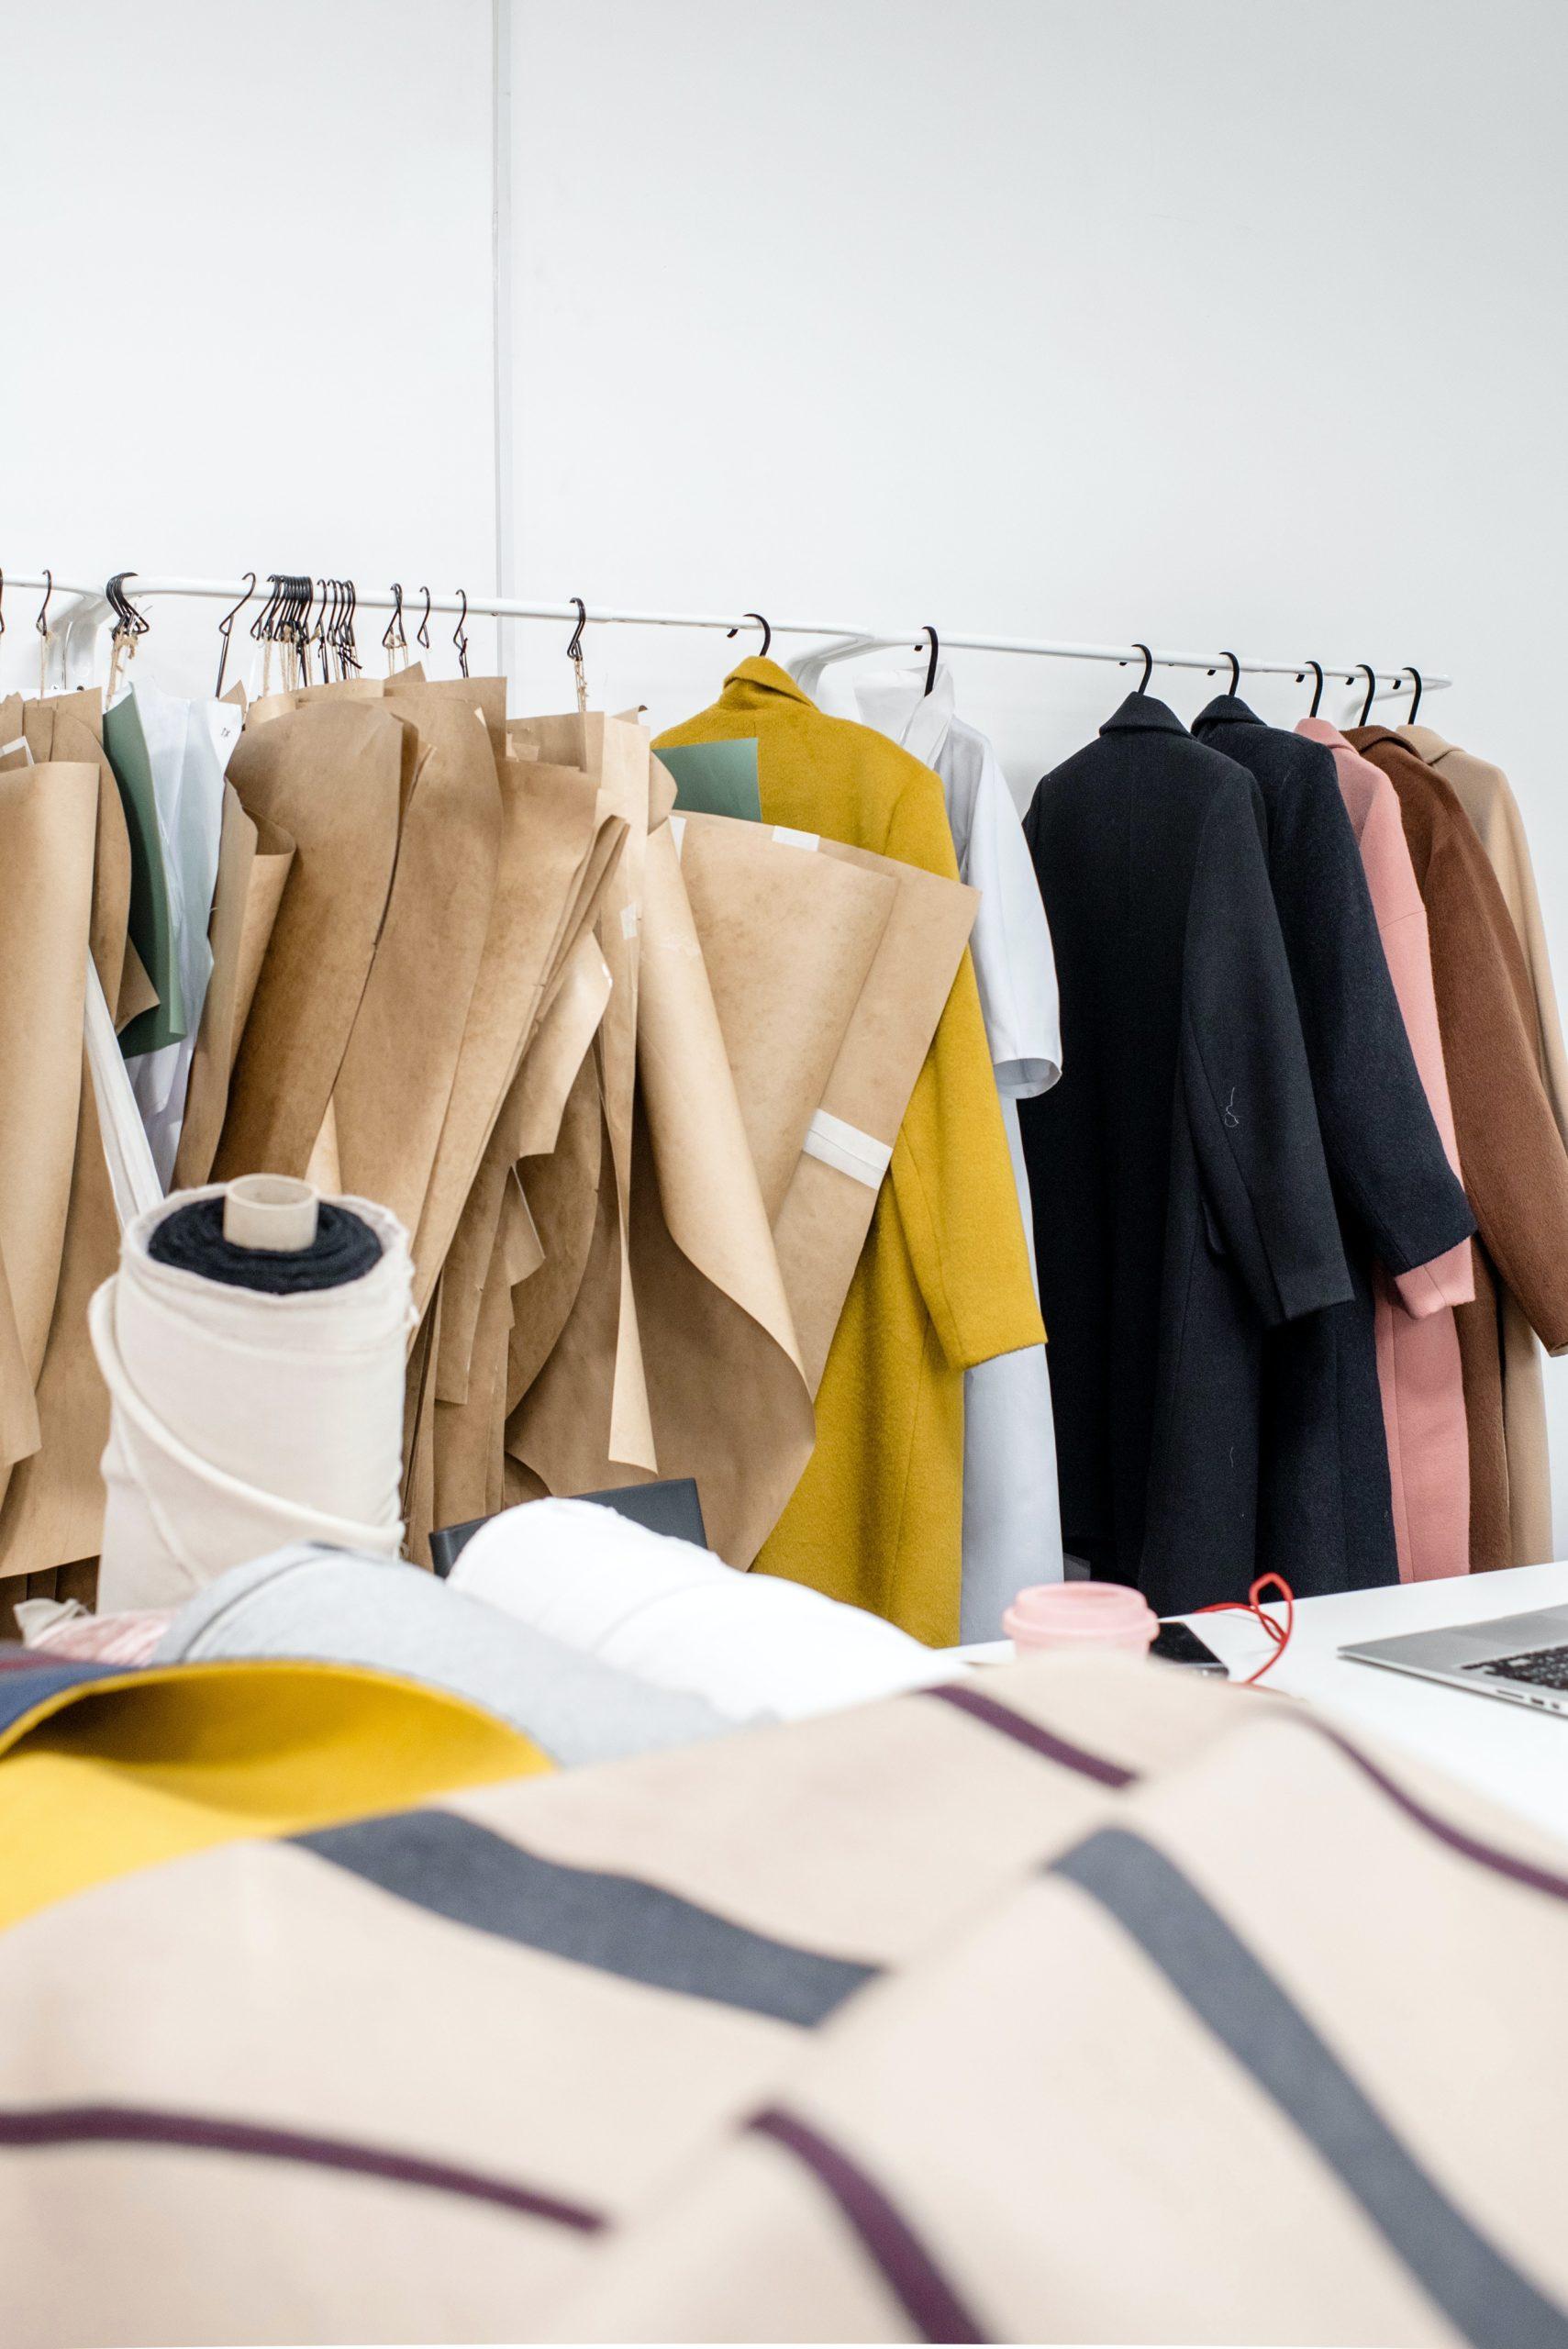 Alles over de Fendi Couture show van Kim Jones